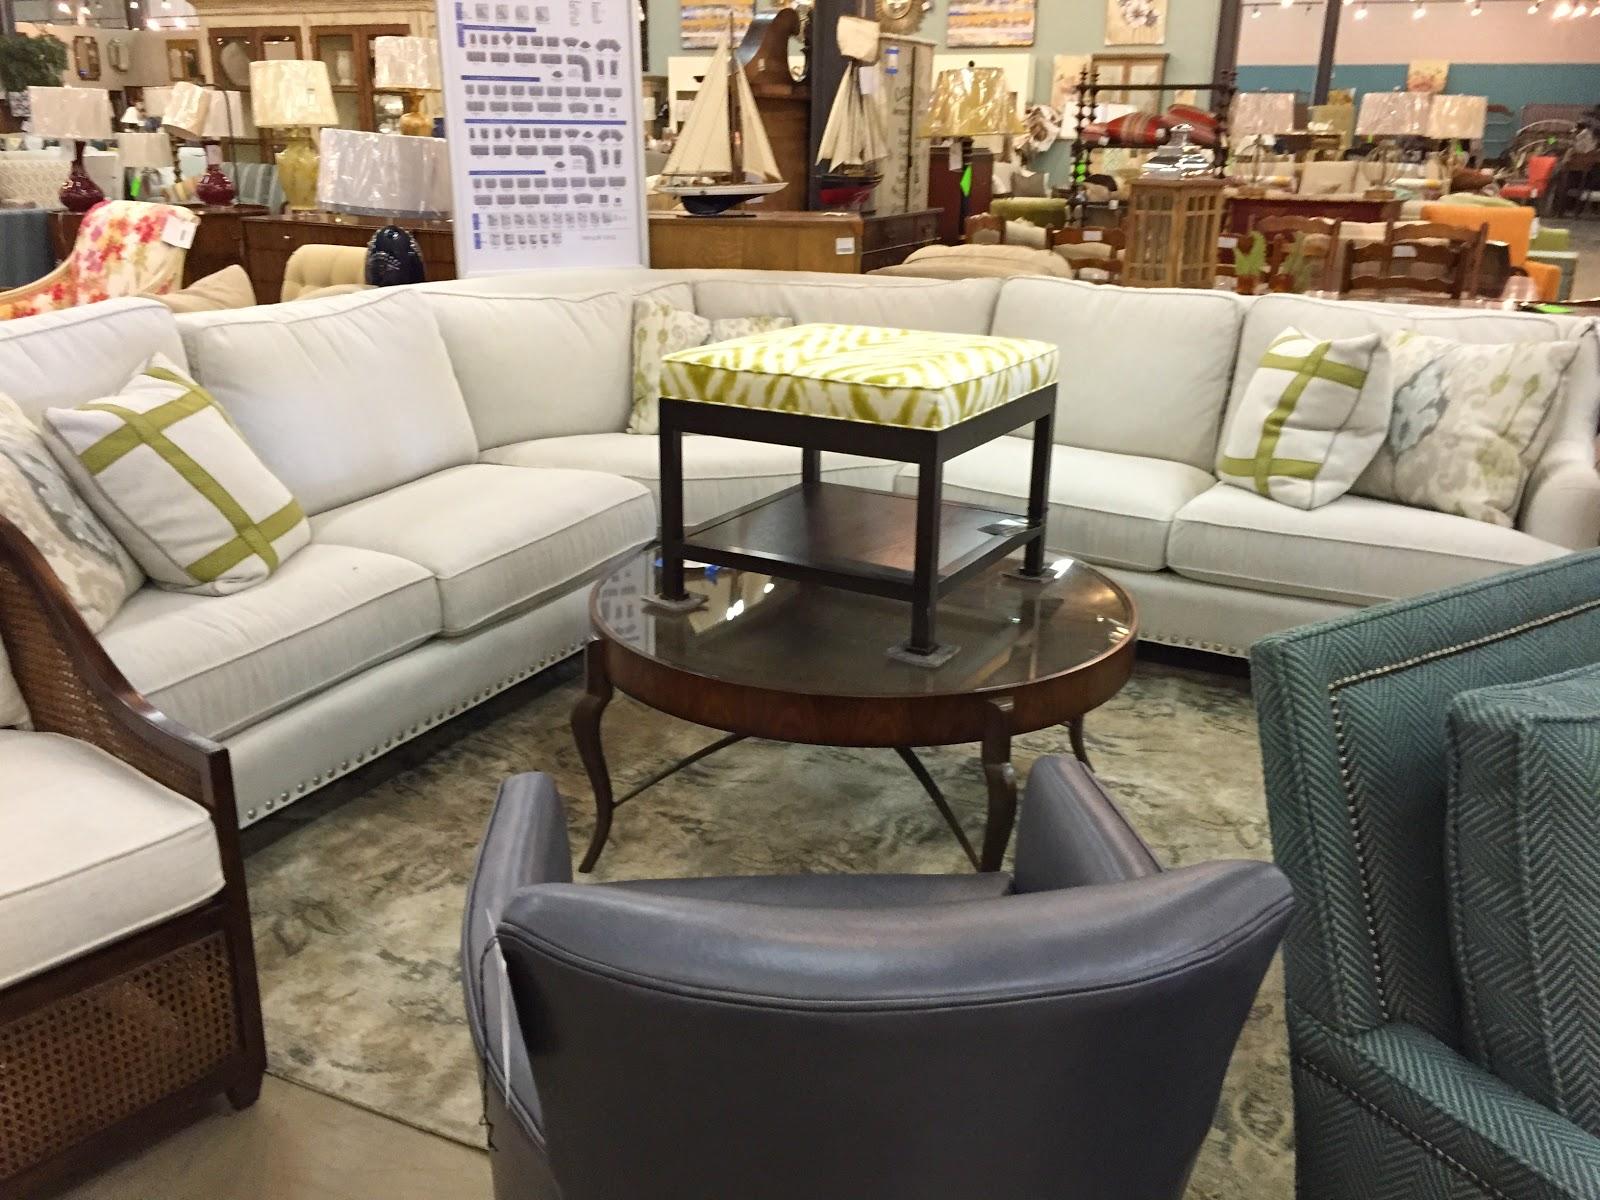 Shop Tour Green Front Furniture in Manassas